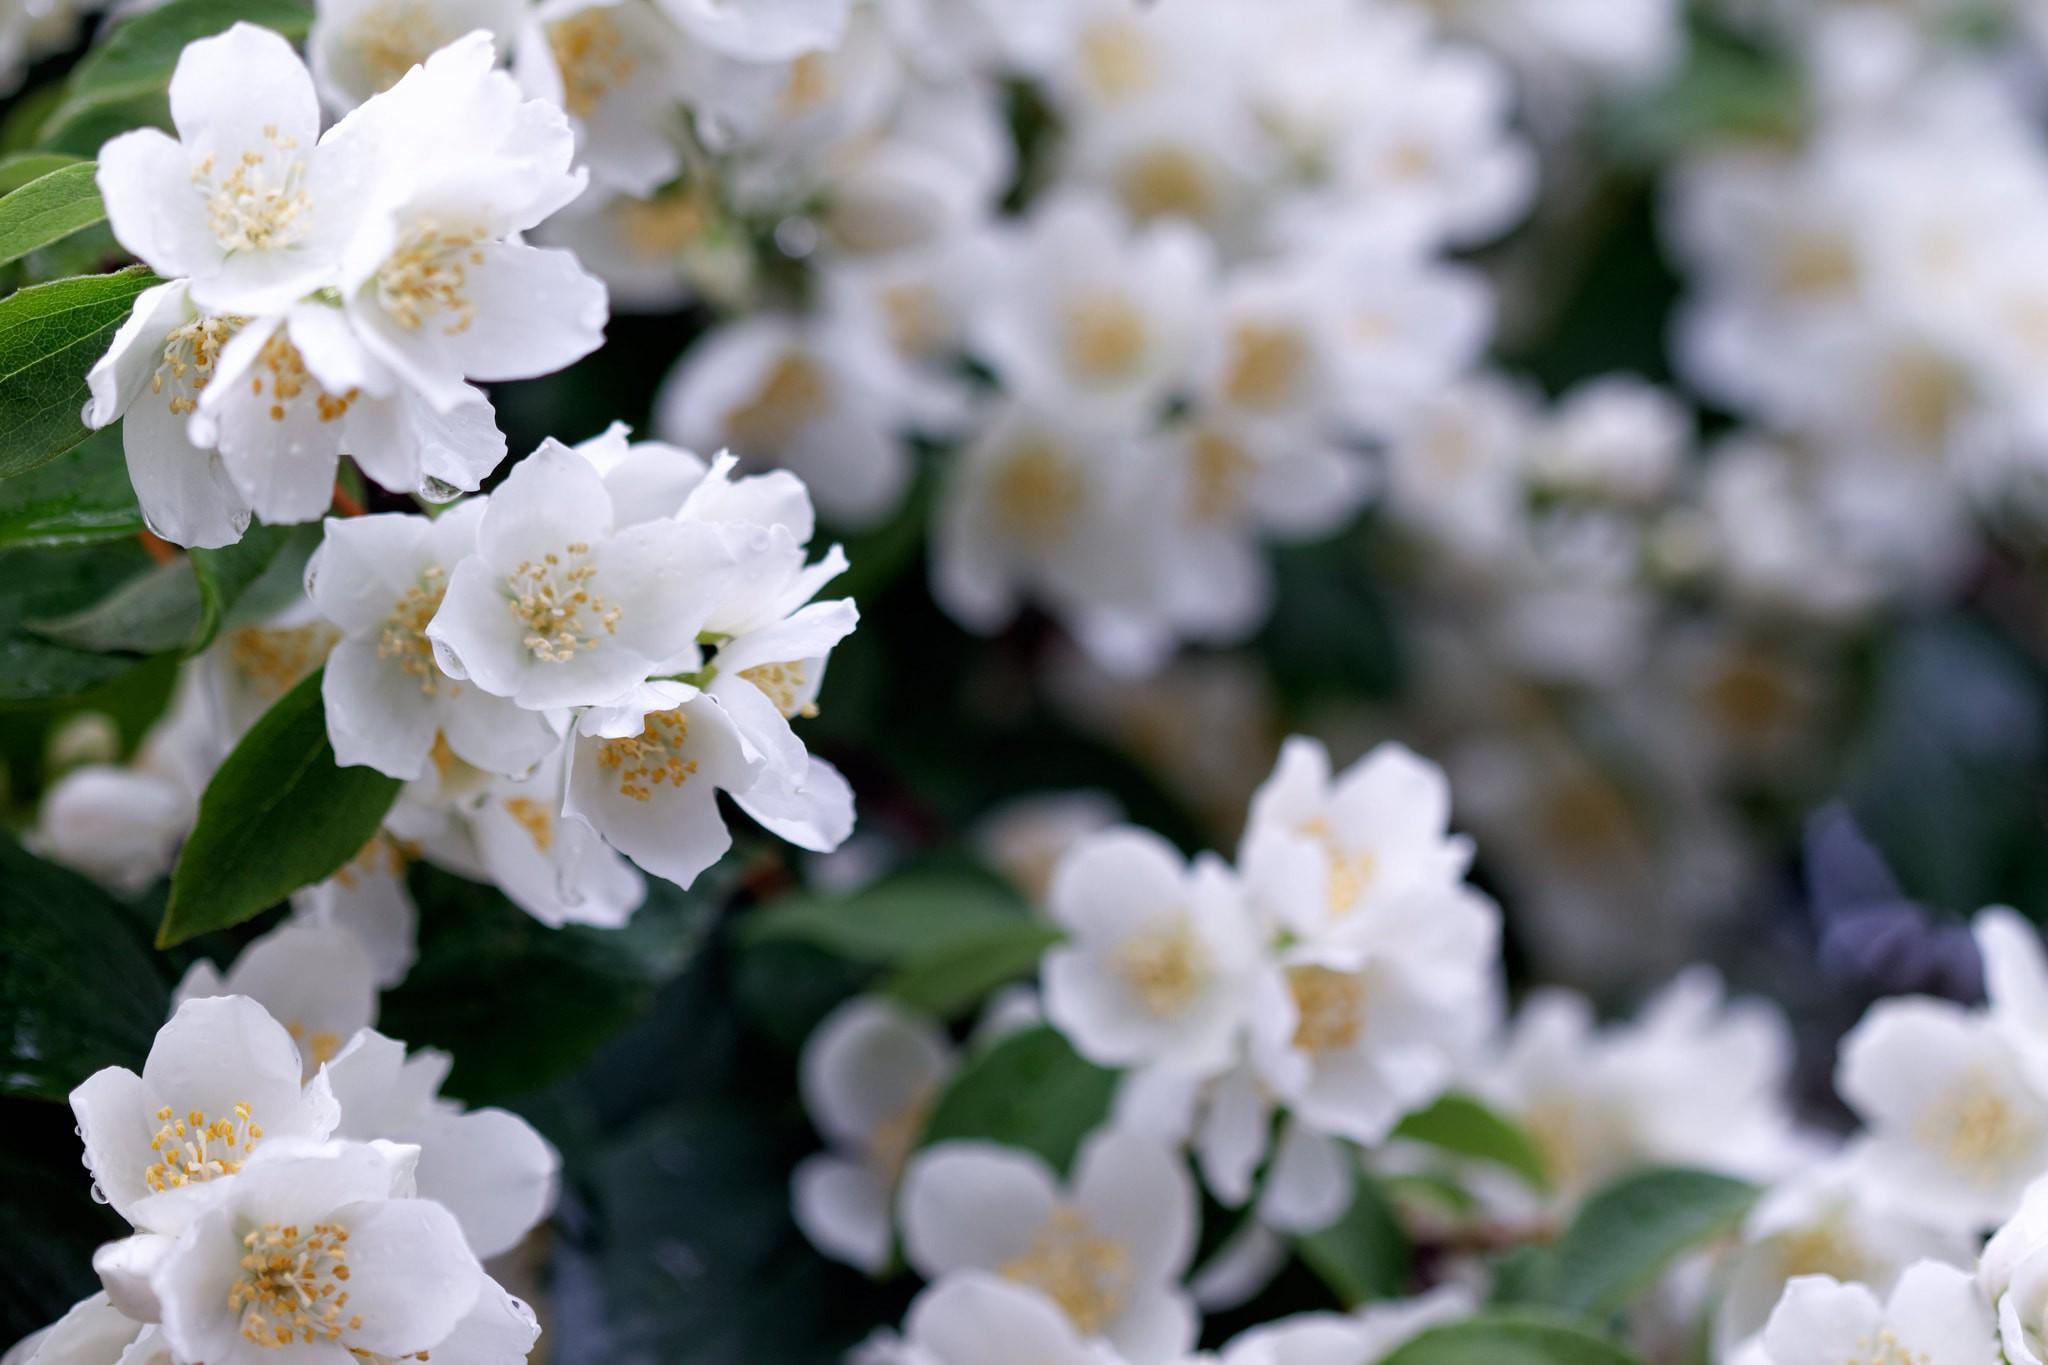 11 beautiful flowers and plants native to thailand izmirmasajfo